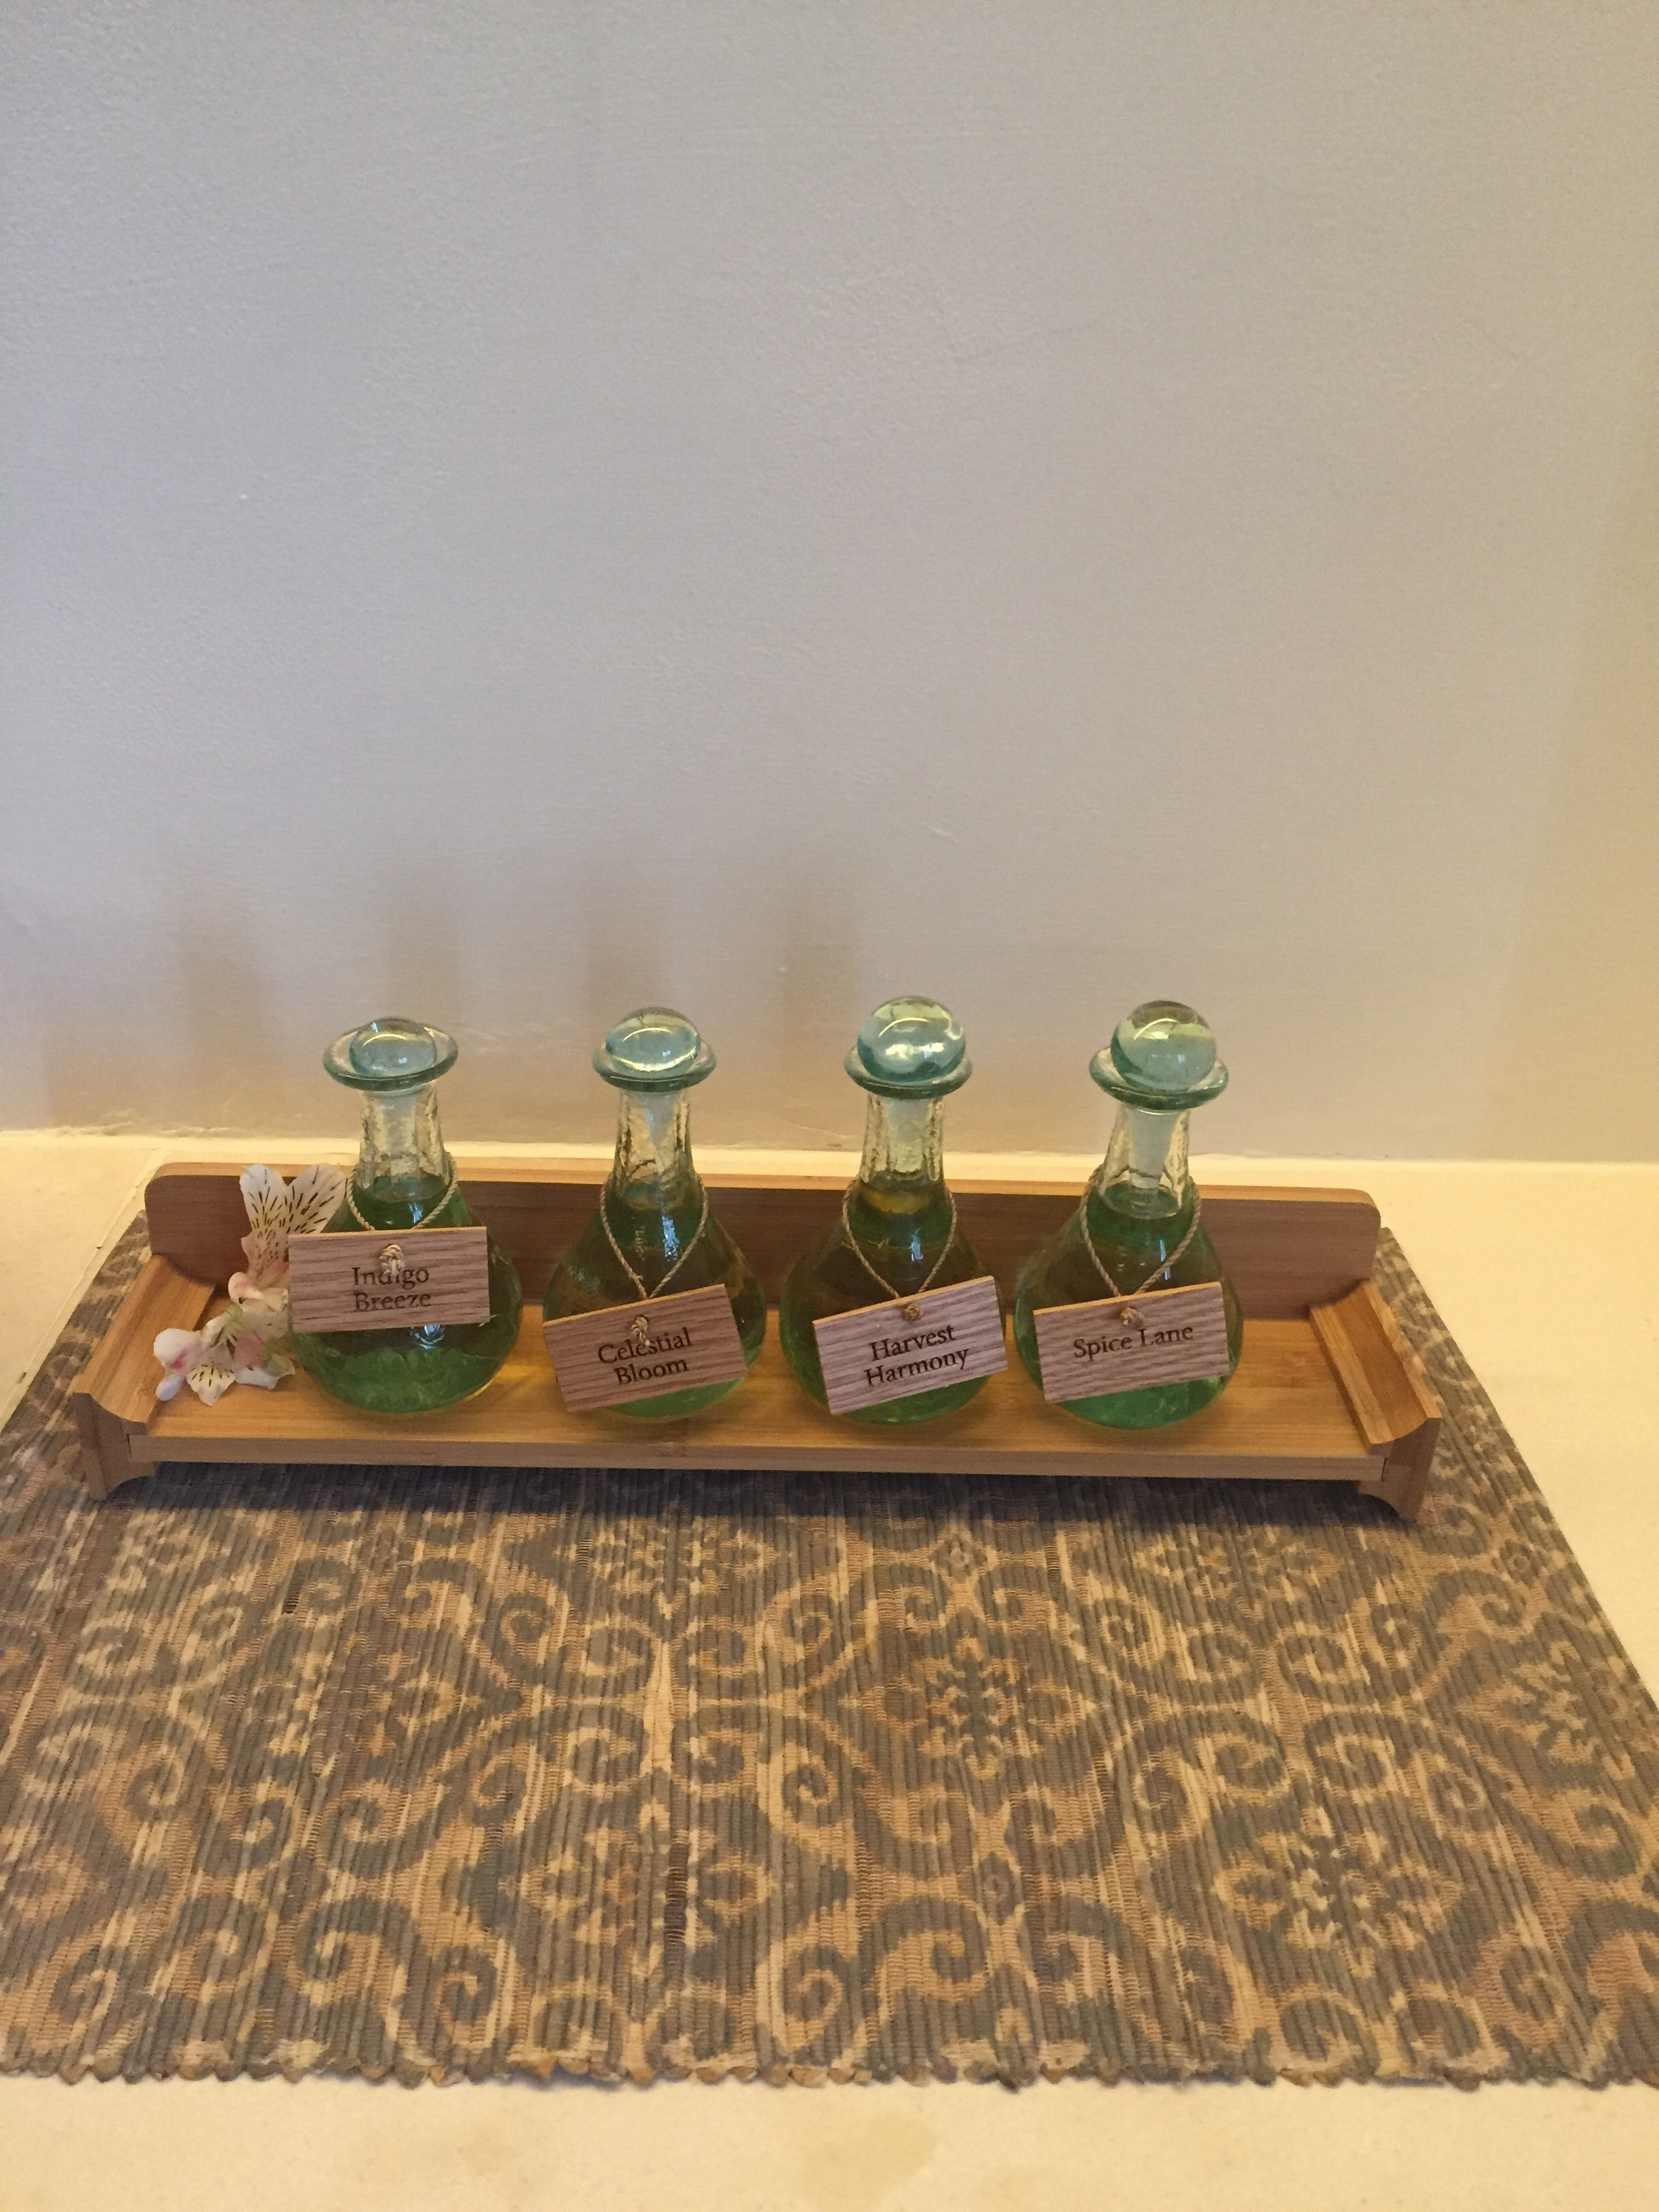 Massage oils to pick from: Indigo Breeze, Celestial Bloom (my pick), Harvest Harmony and Spice Lane.